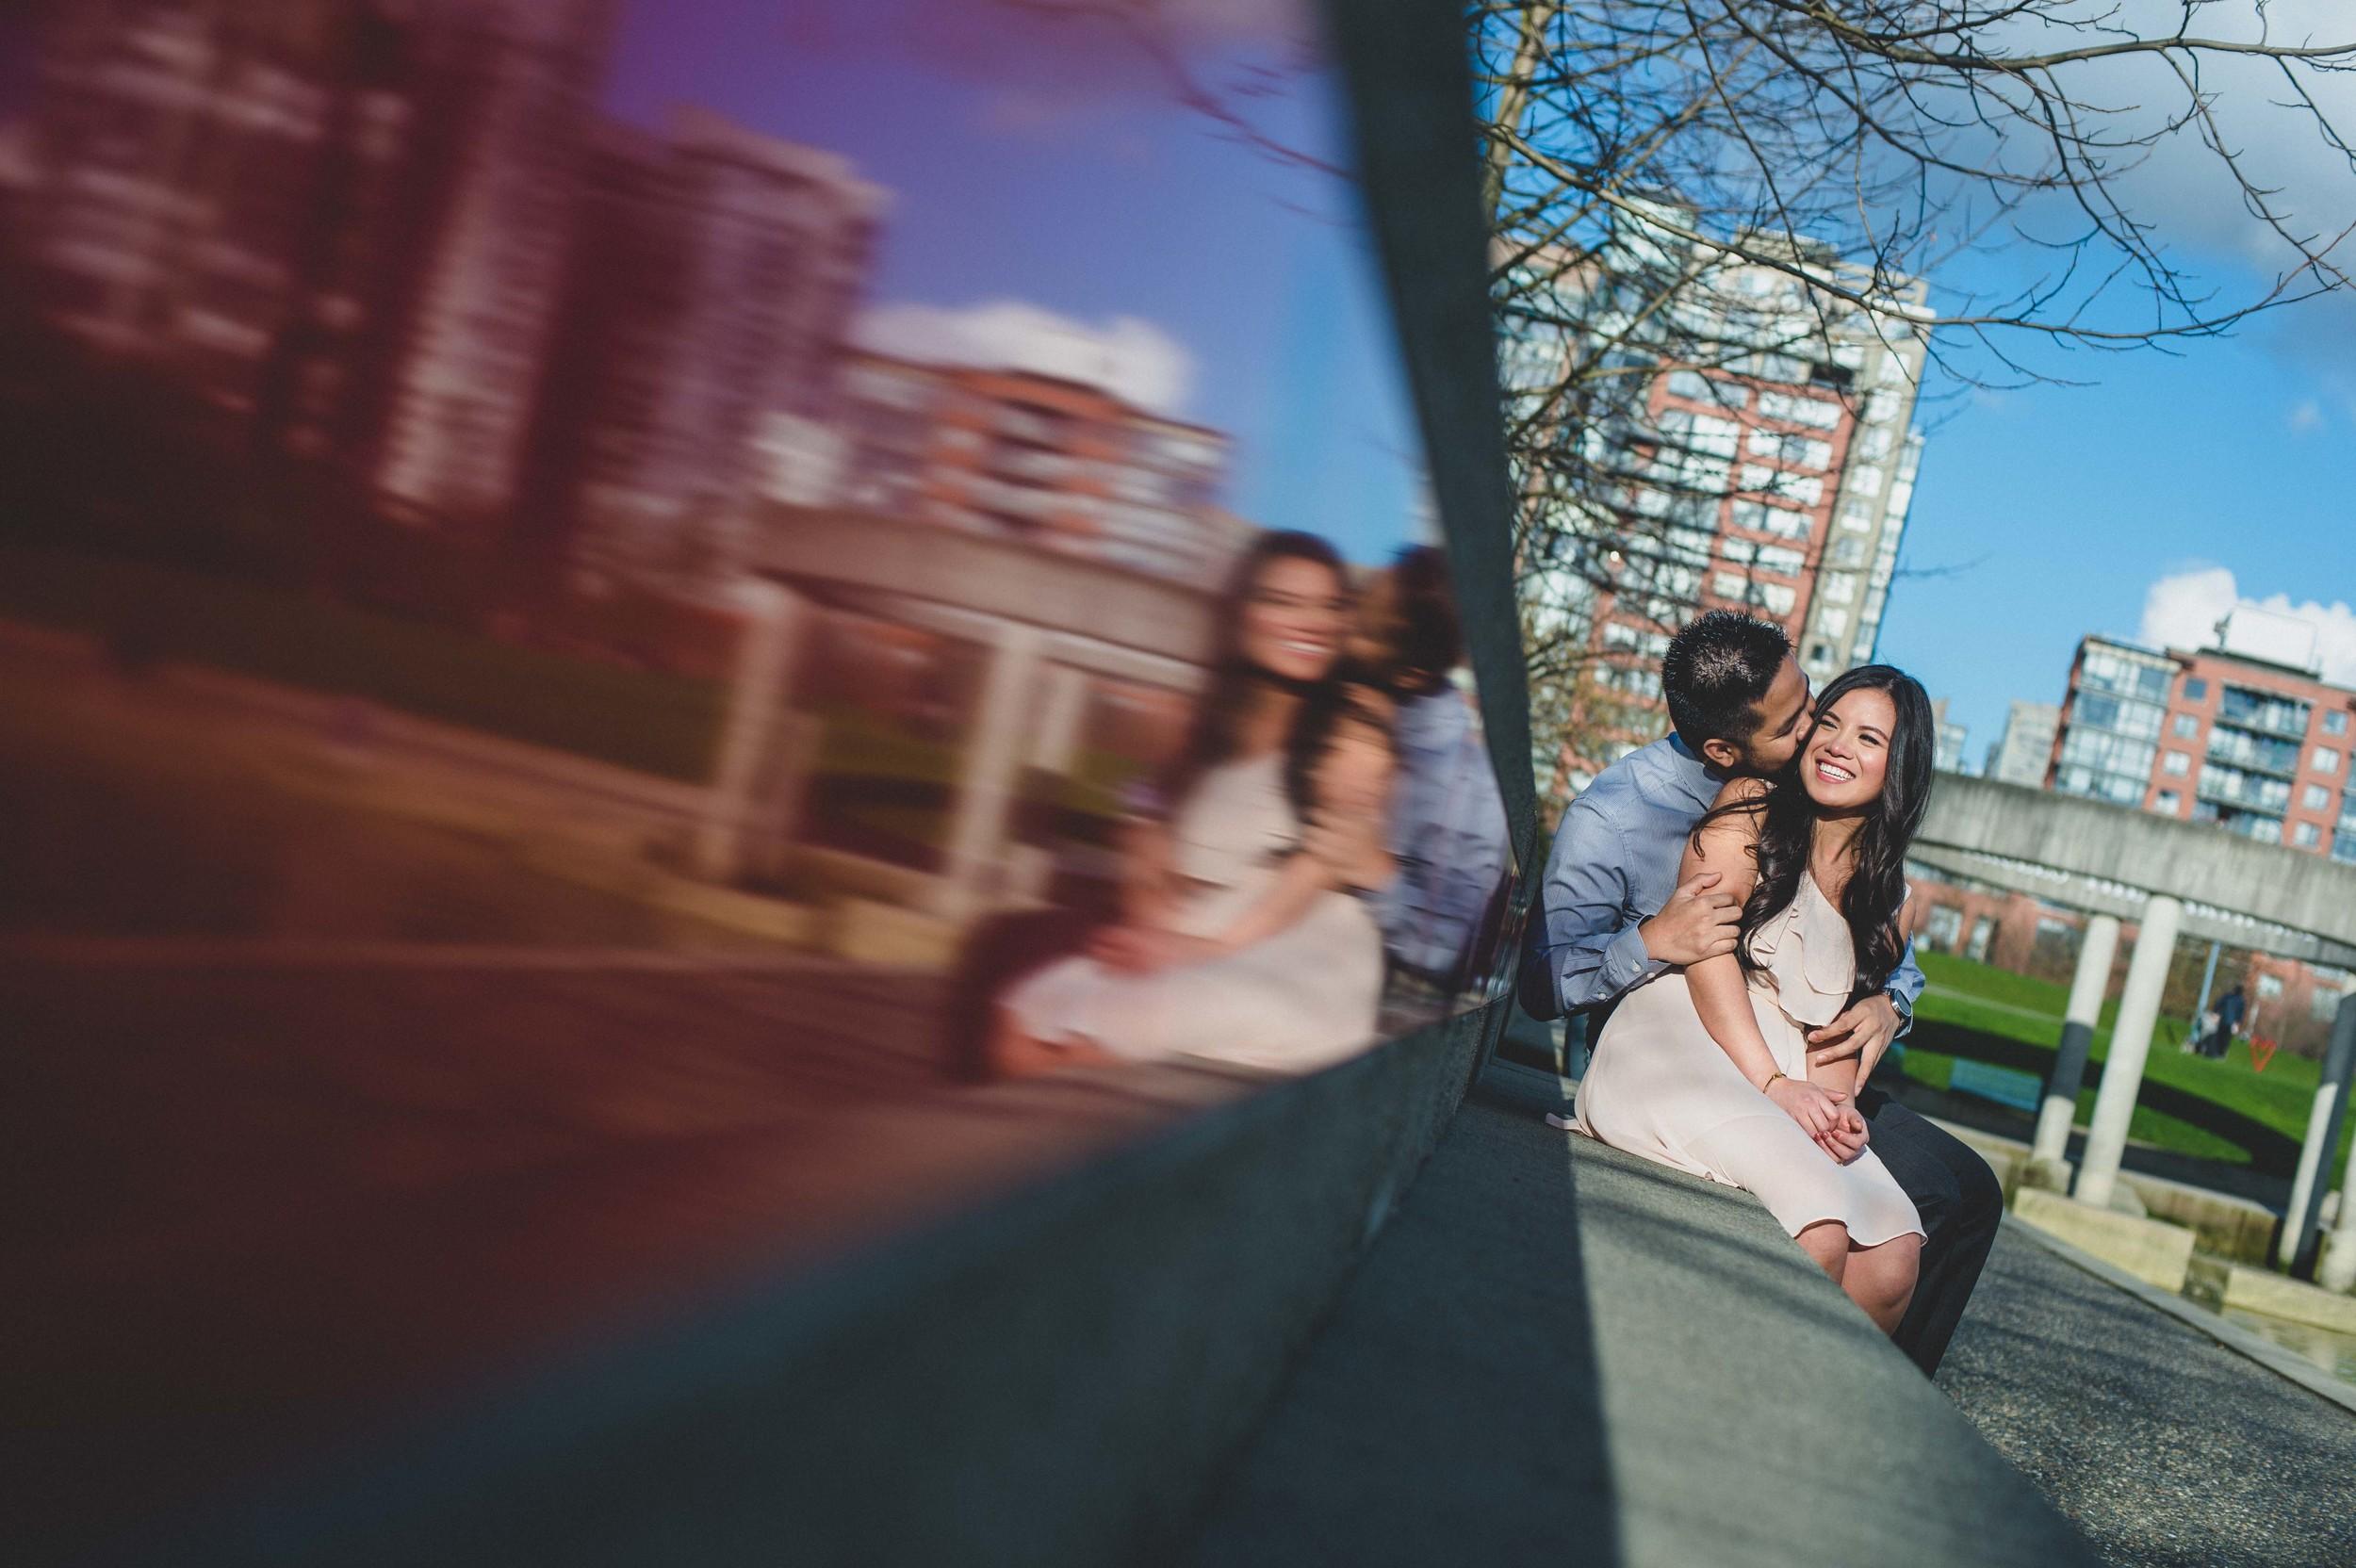 Vancouver David Lam Park Wedding Photographer Edward Lai Photography-2.jpg